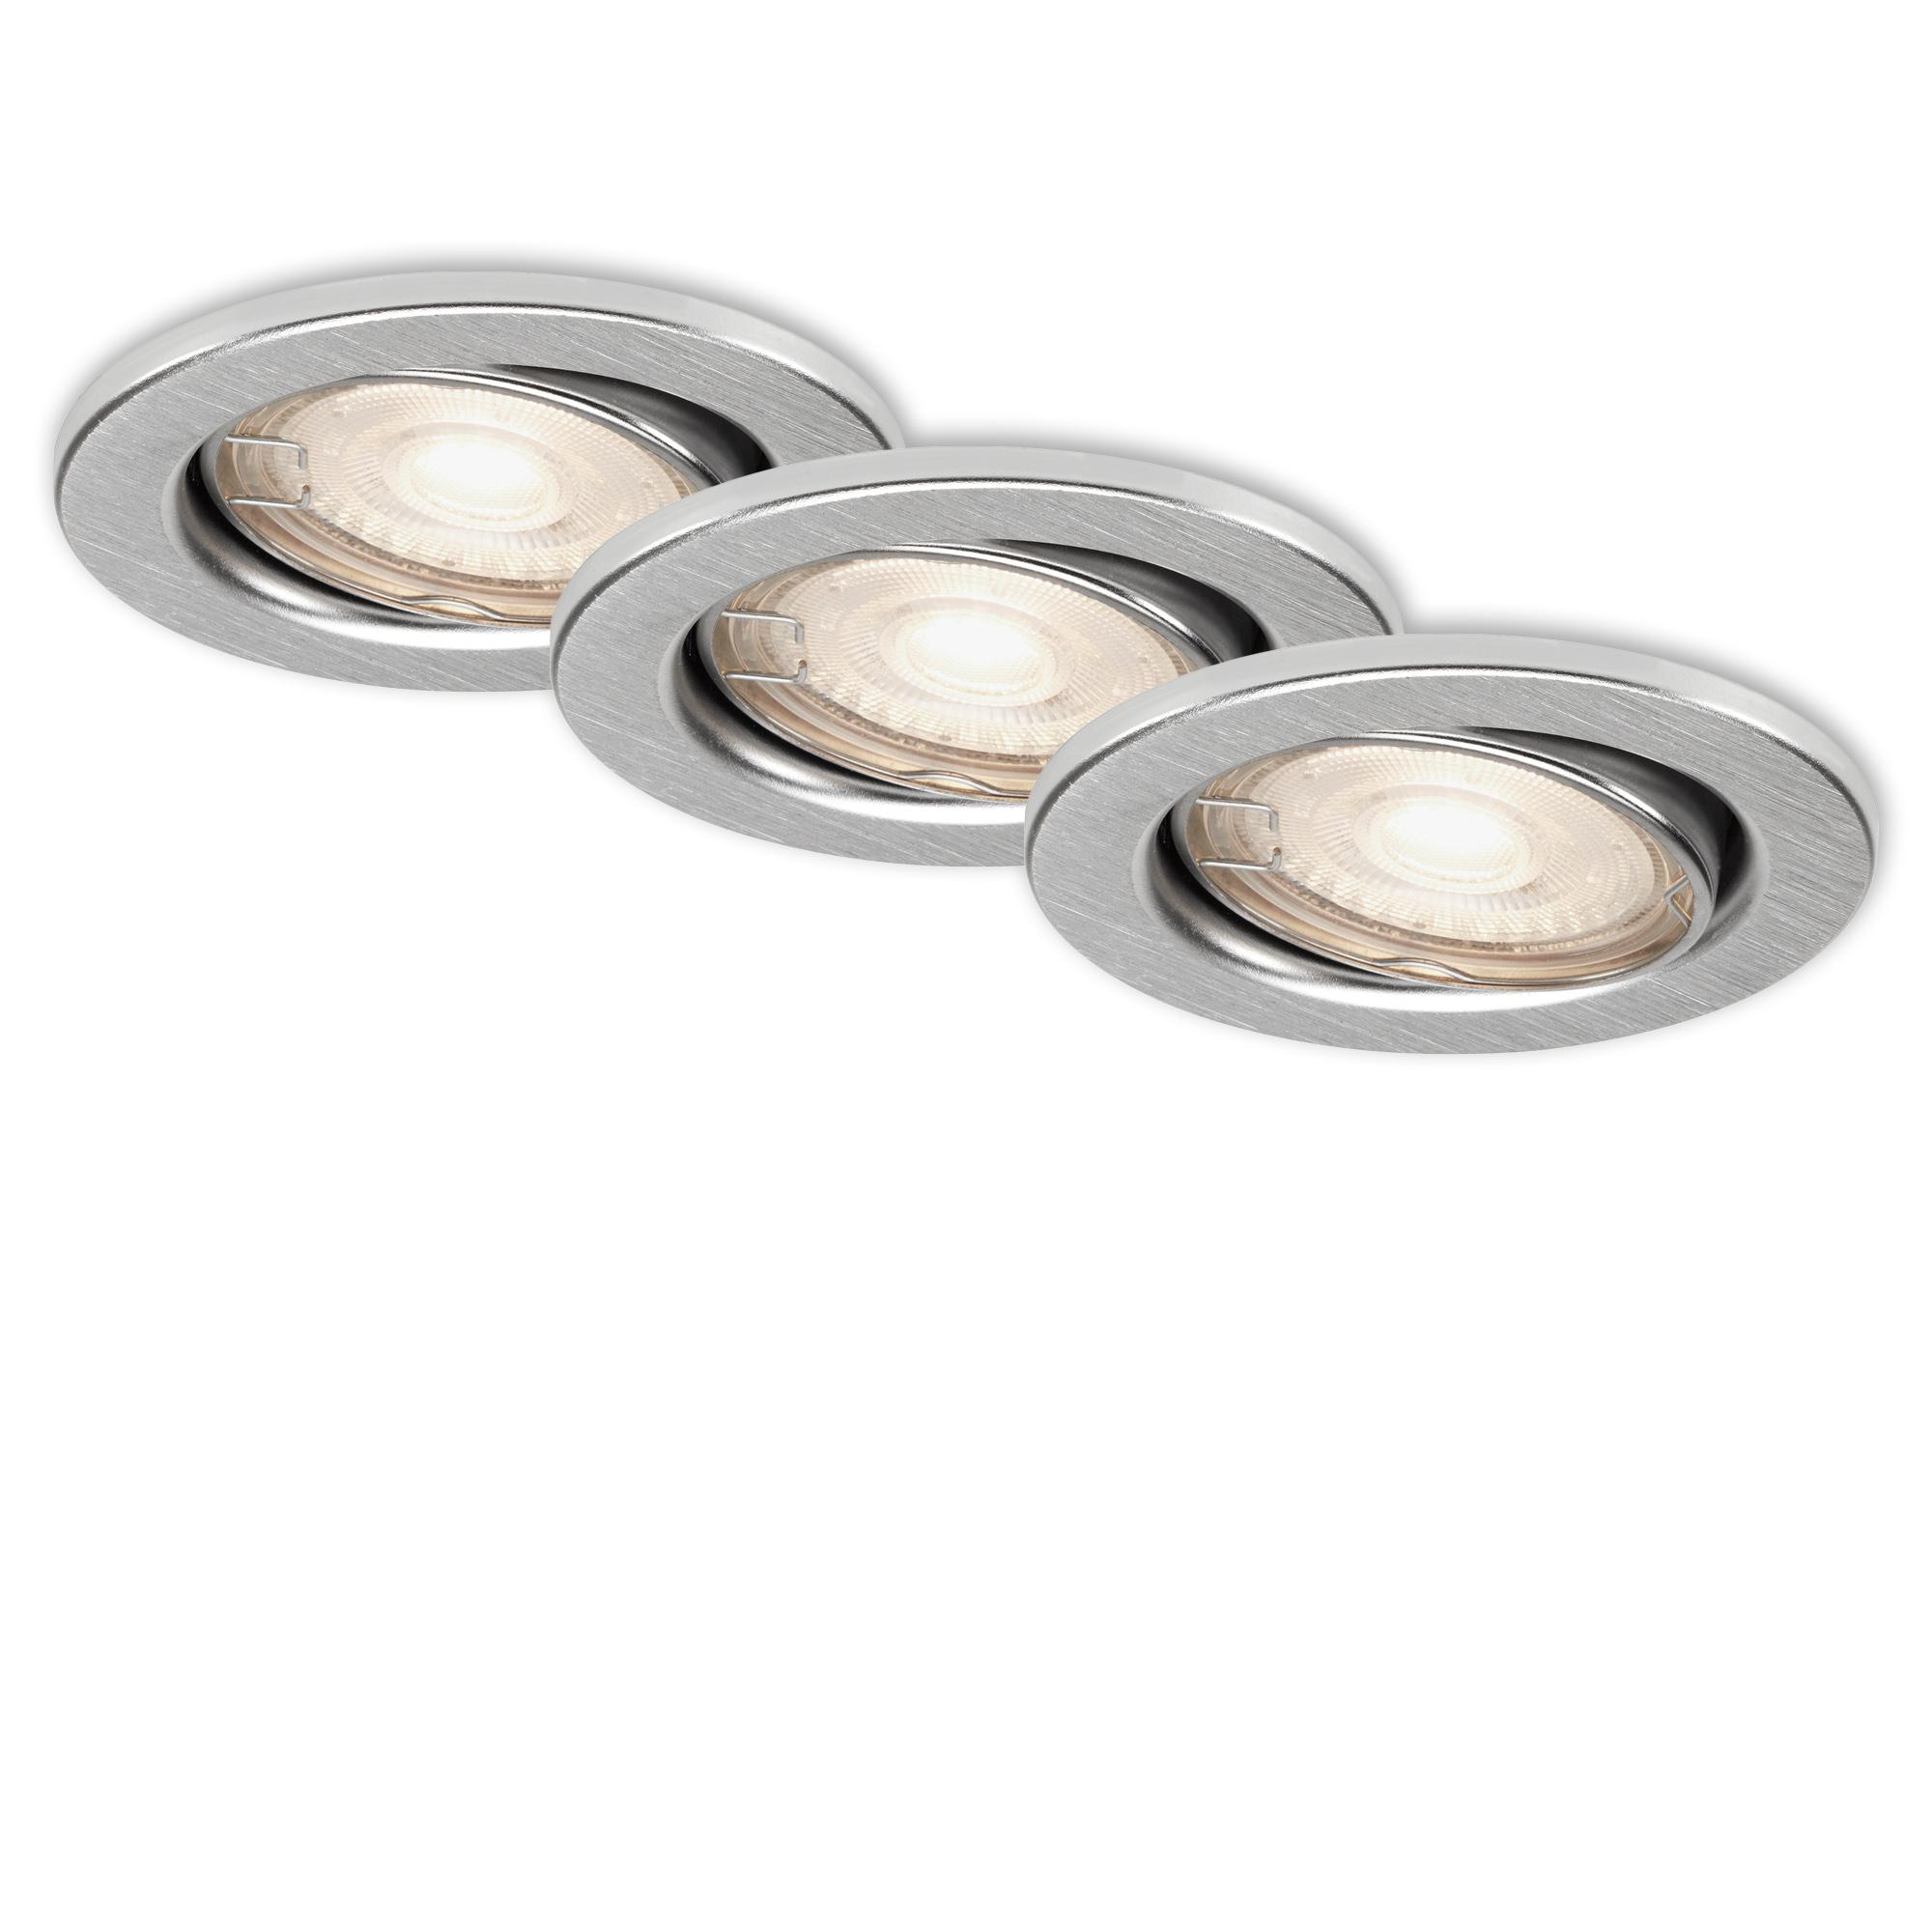 3er LED Einbauleuchte, Ø 8,6 cm, 5 W, Alu